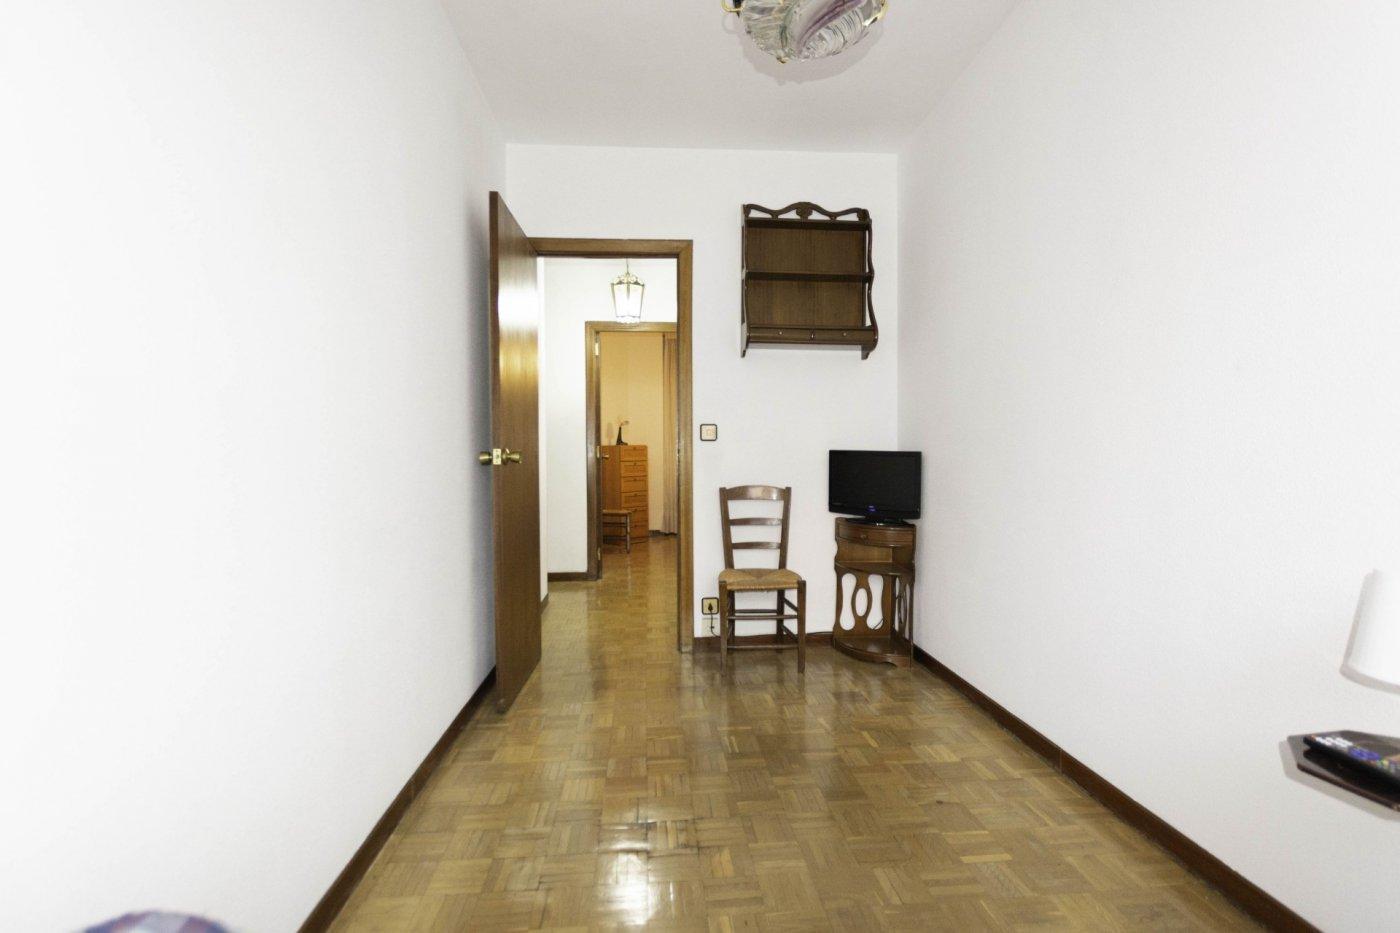 Apartamento en vallobin - imagenInmueble8